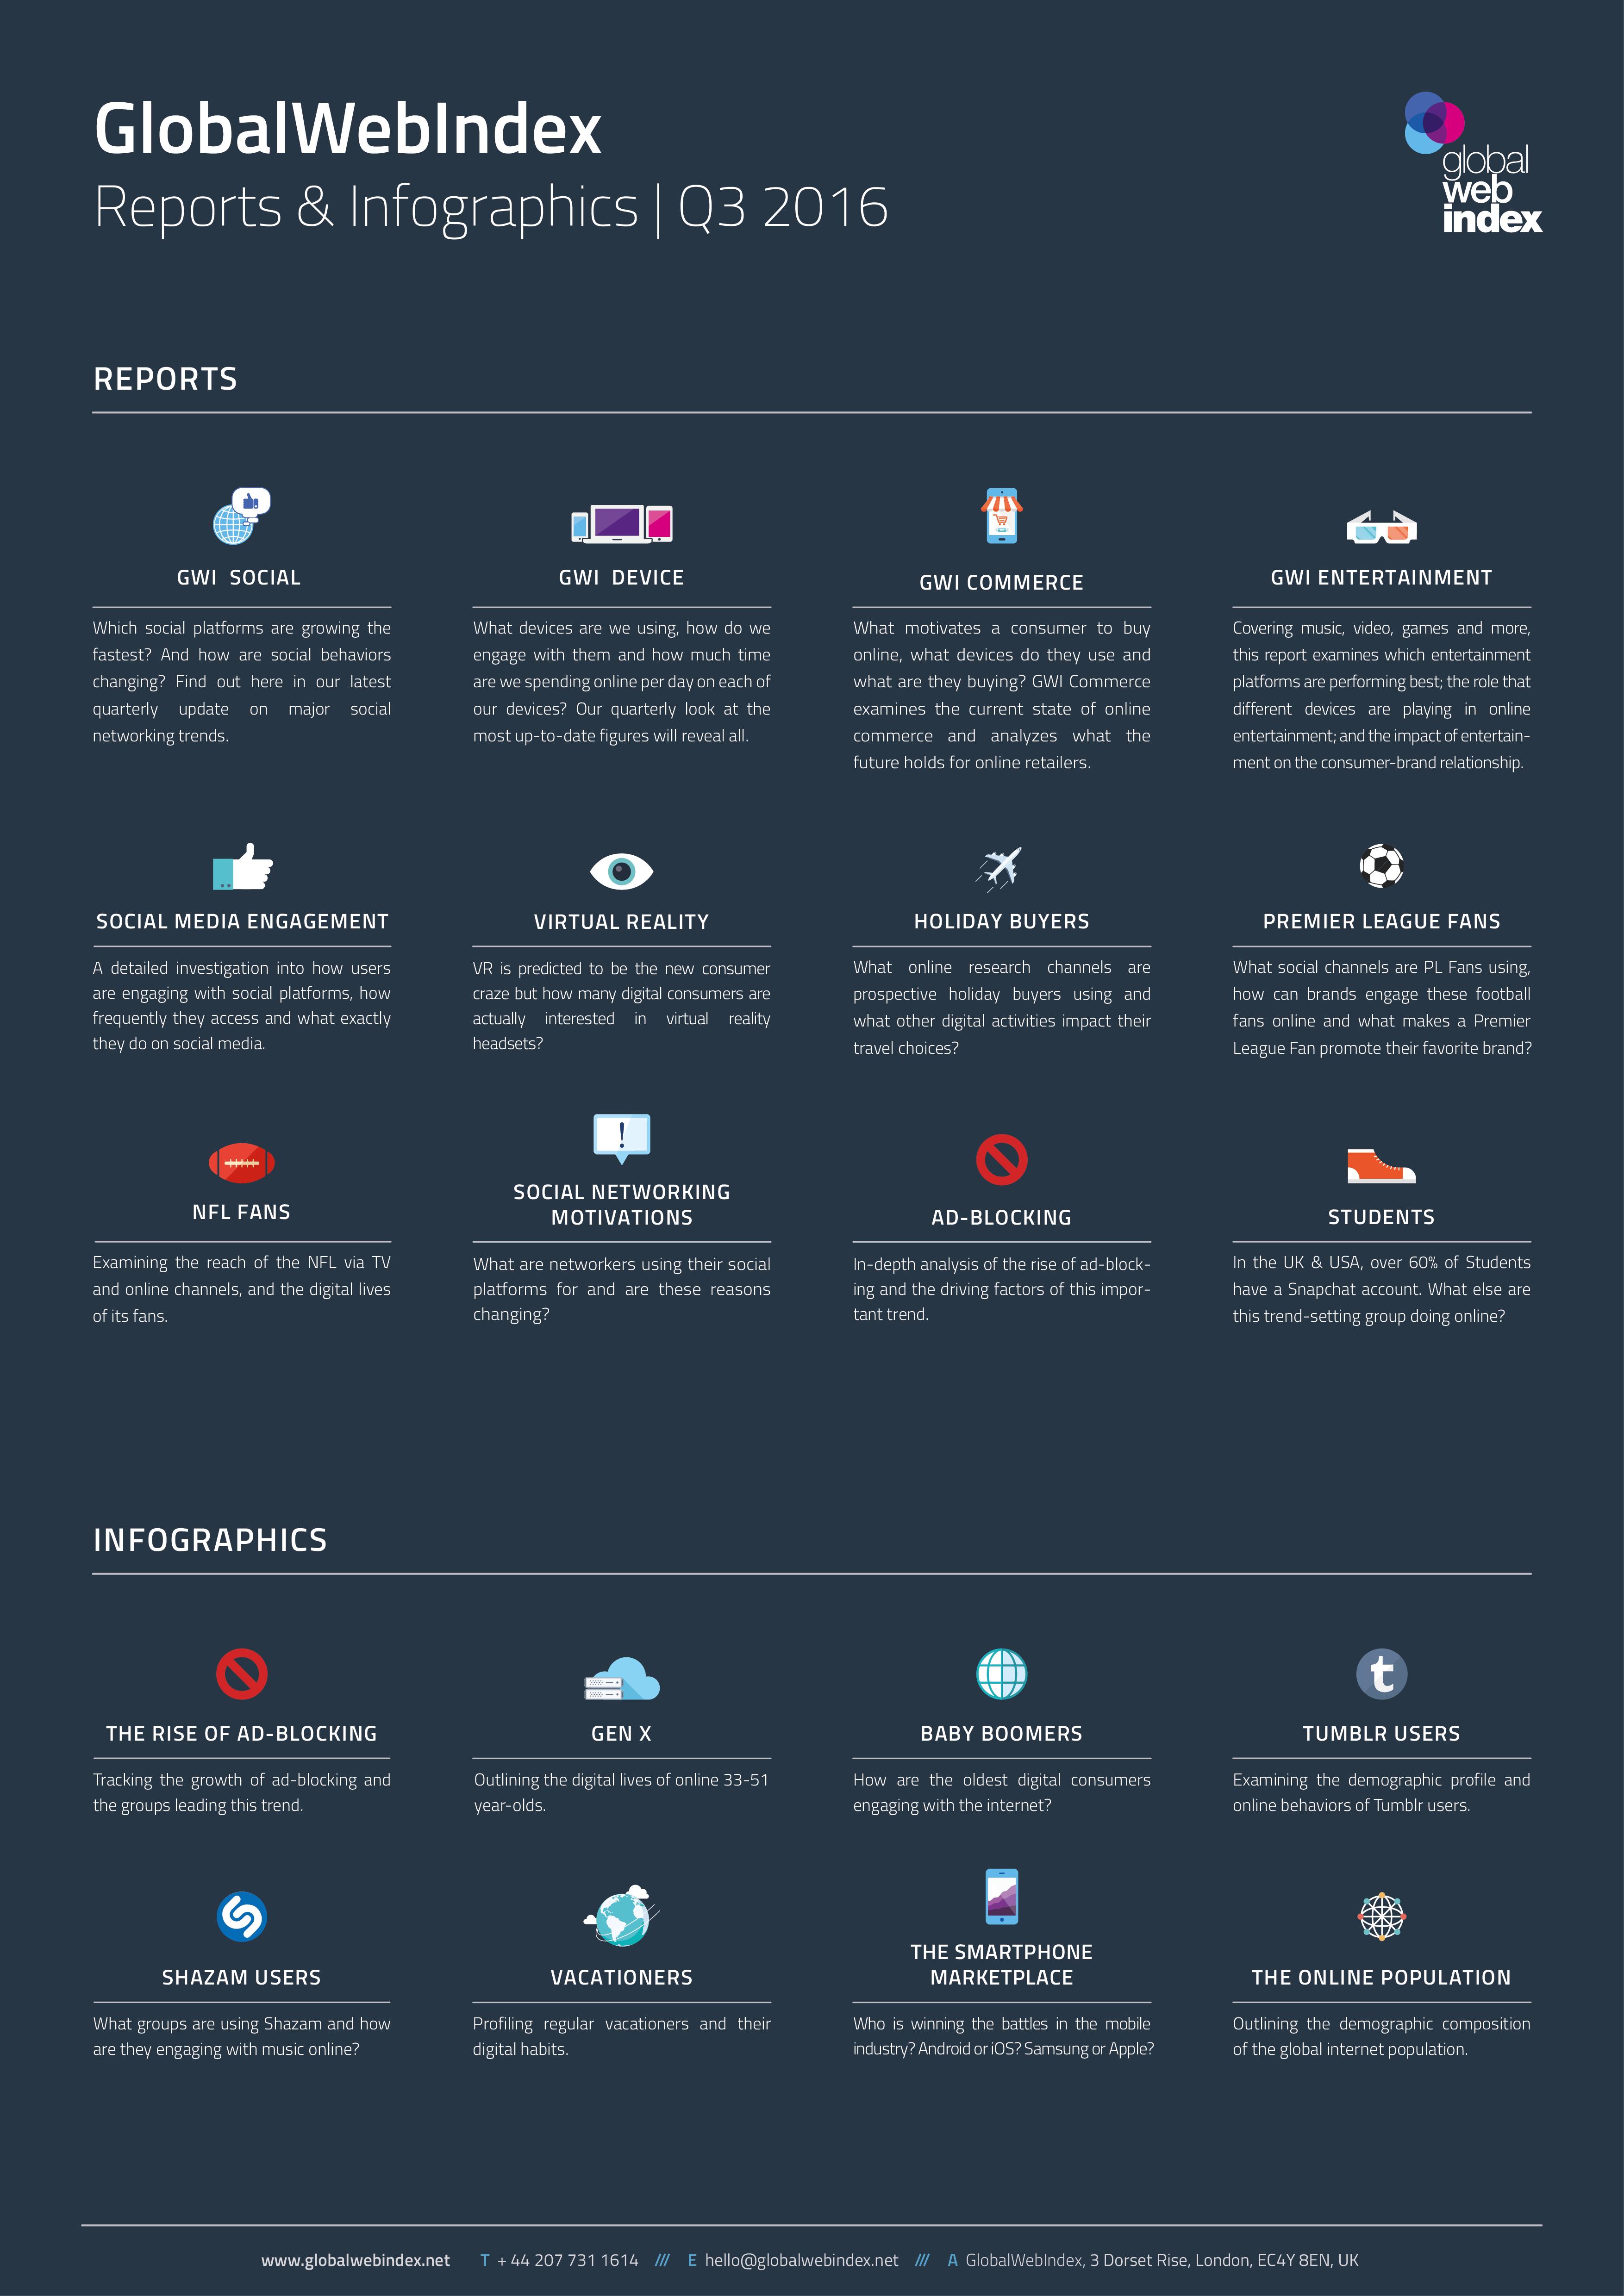 Q3 2016 Reports from GlobalWebIndex